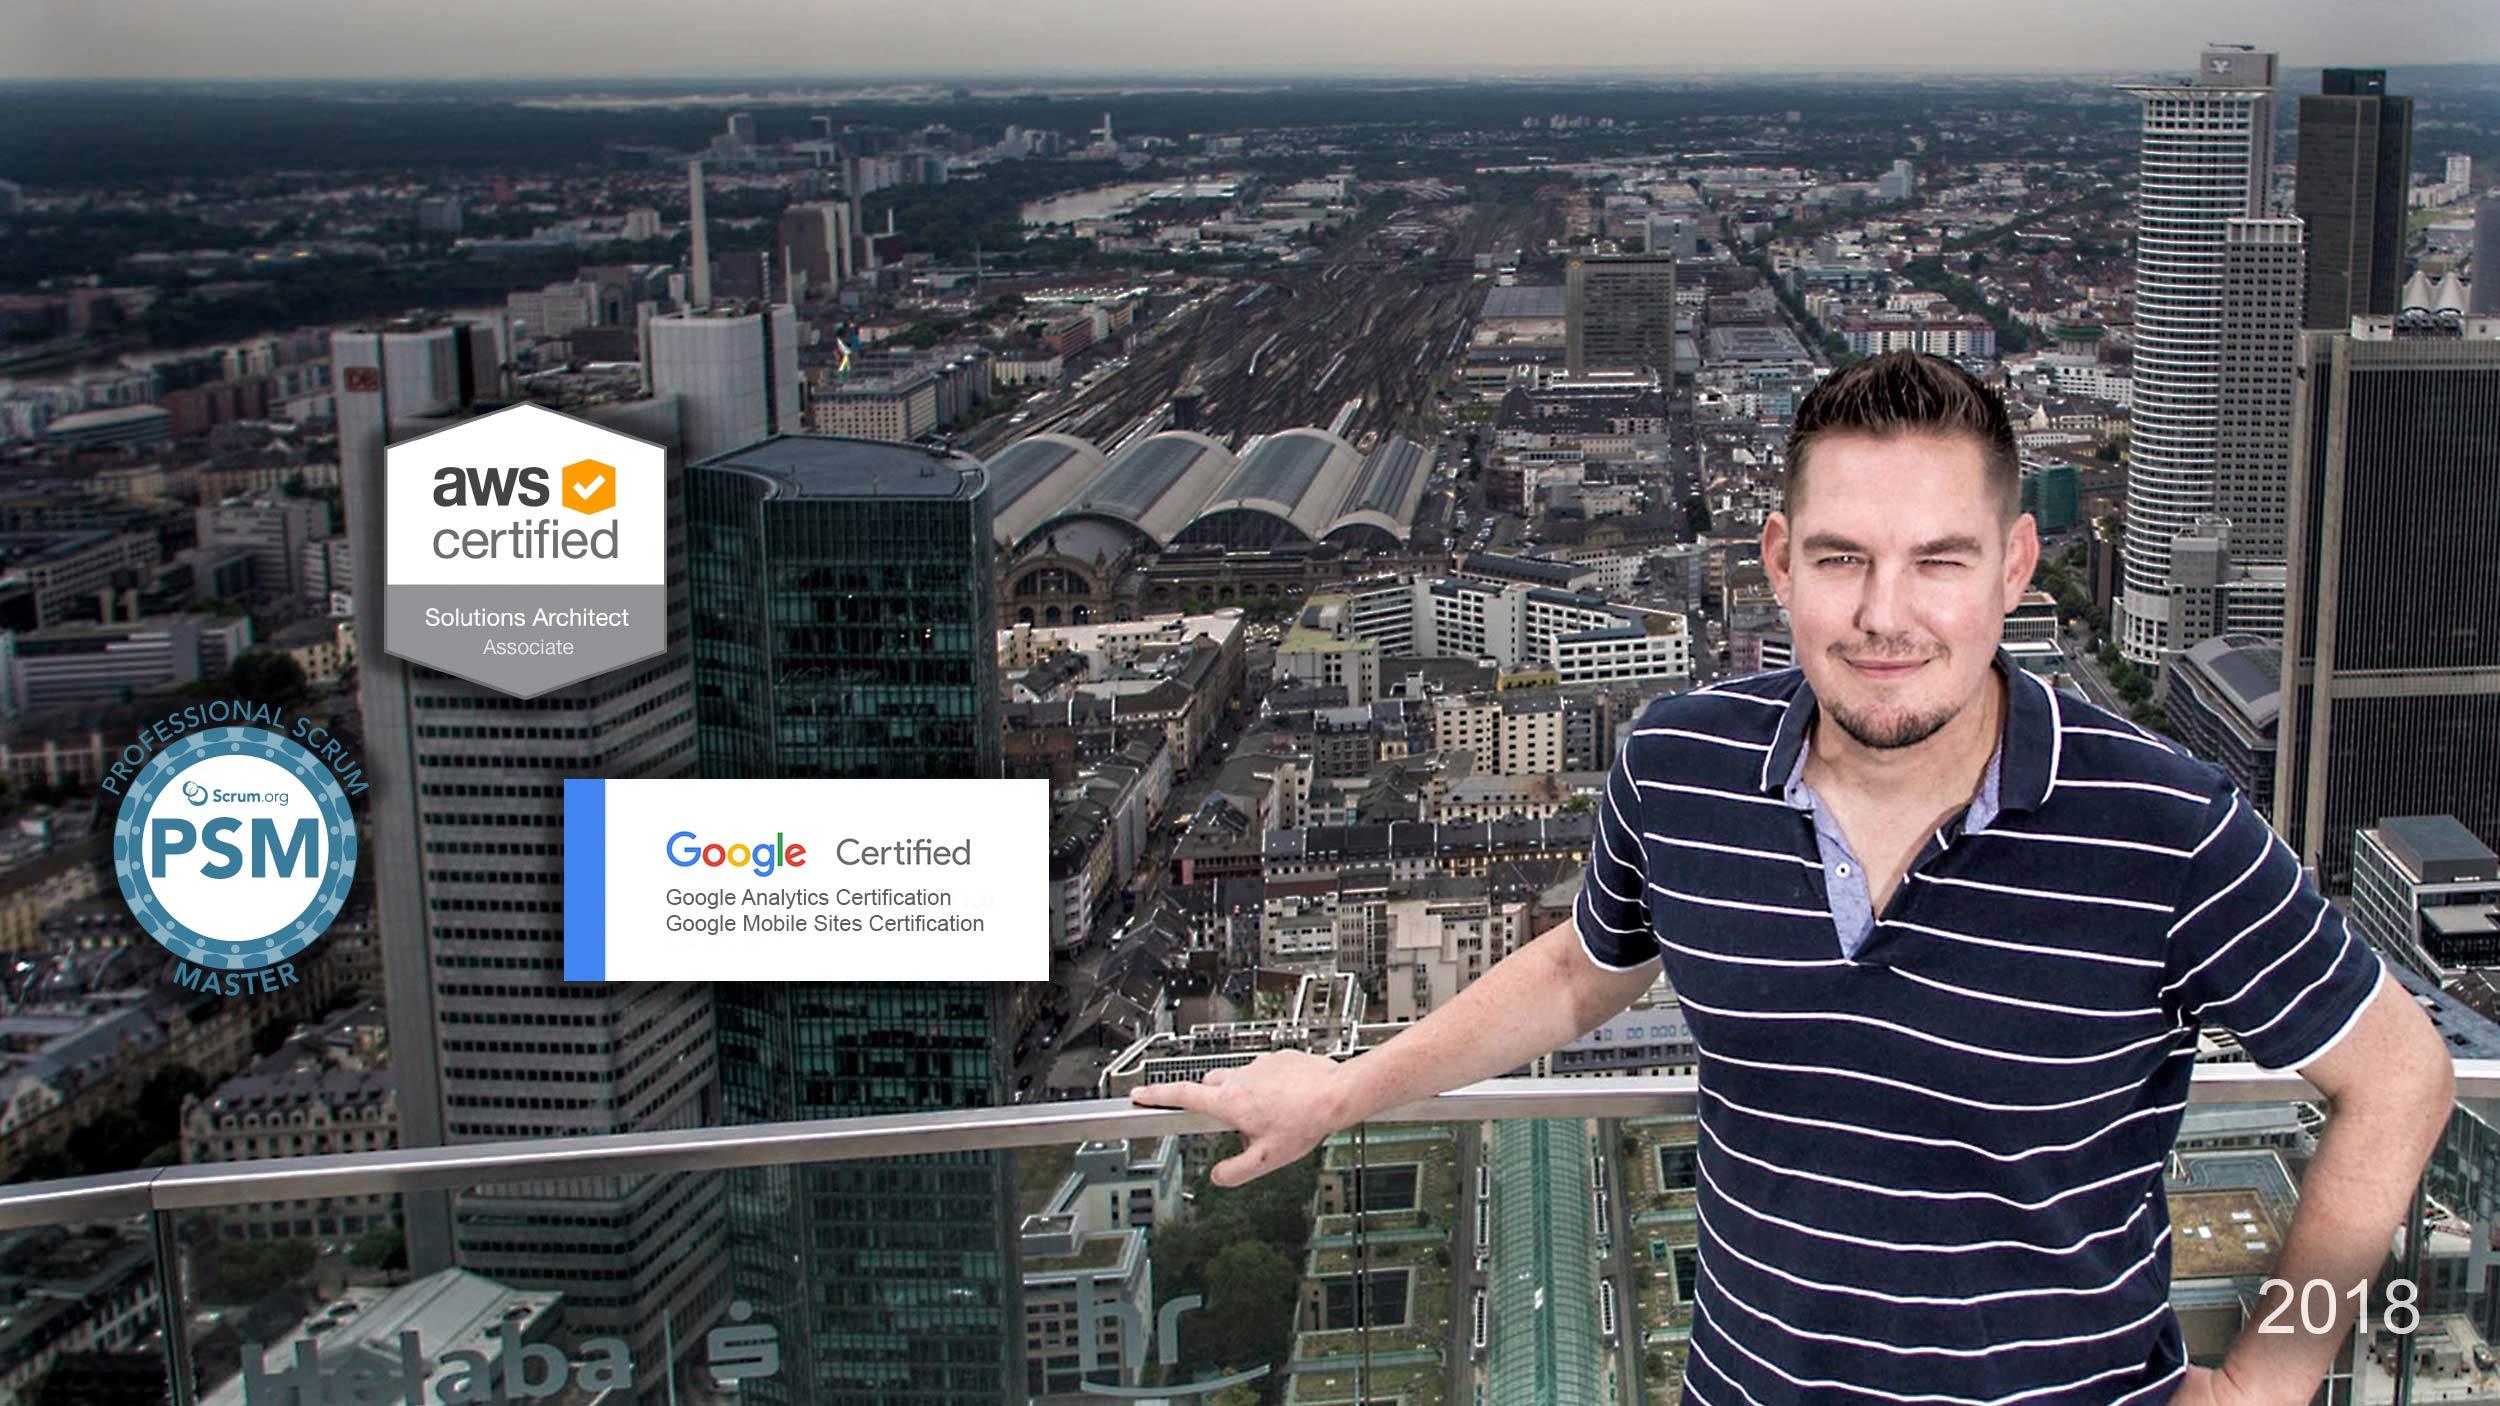 Full Stack Webentwickler Frankfurt - Data Engineer - Webexperte Frankfurt - IT Projektleiter Frankfurt